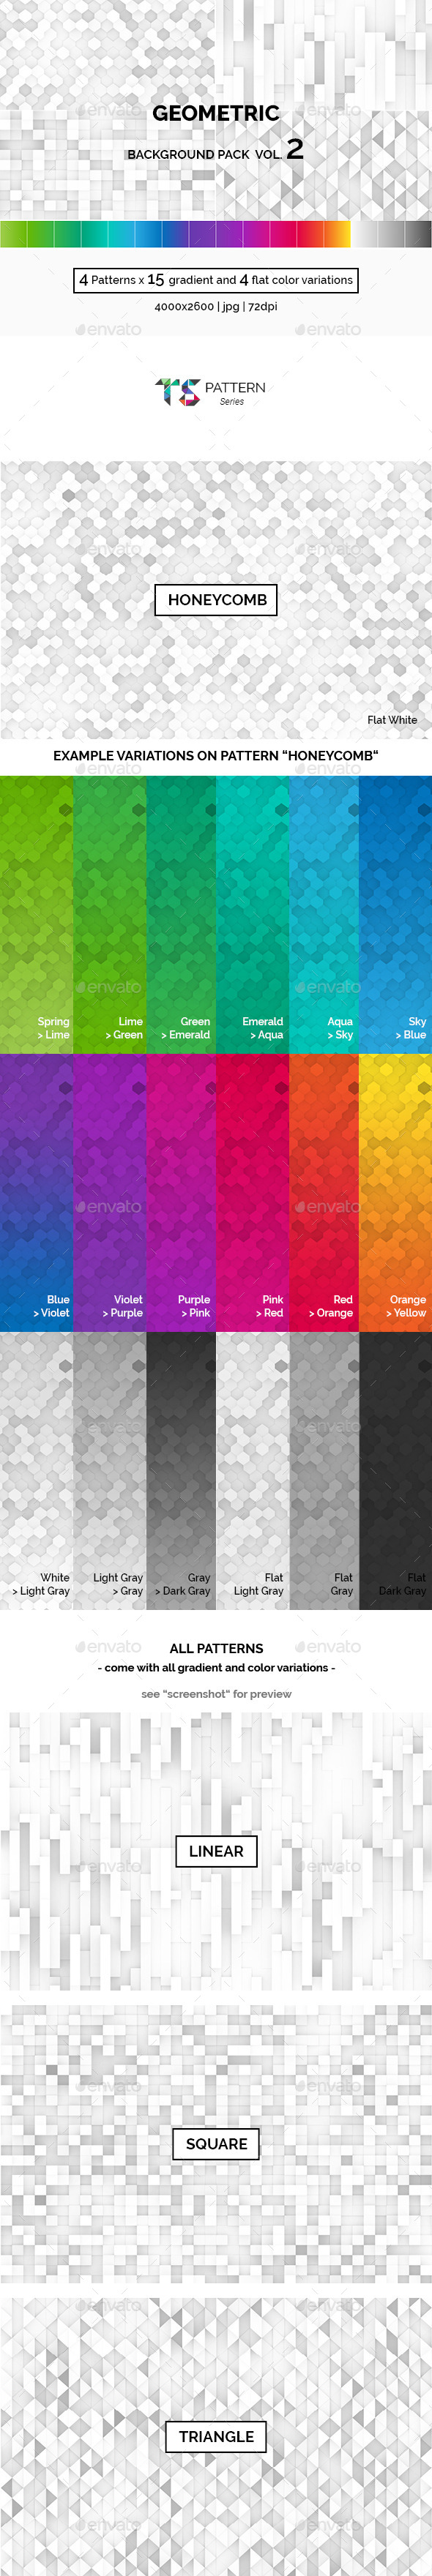 Geometric Background Pack Vol.2